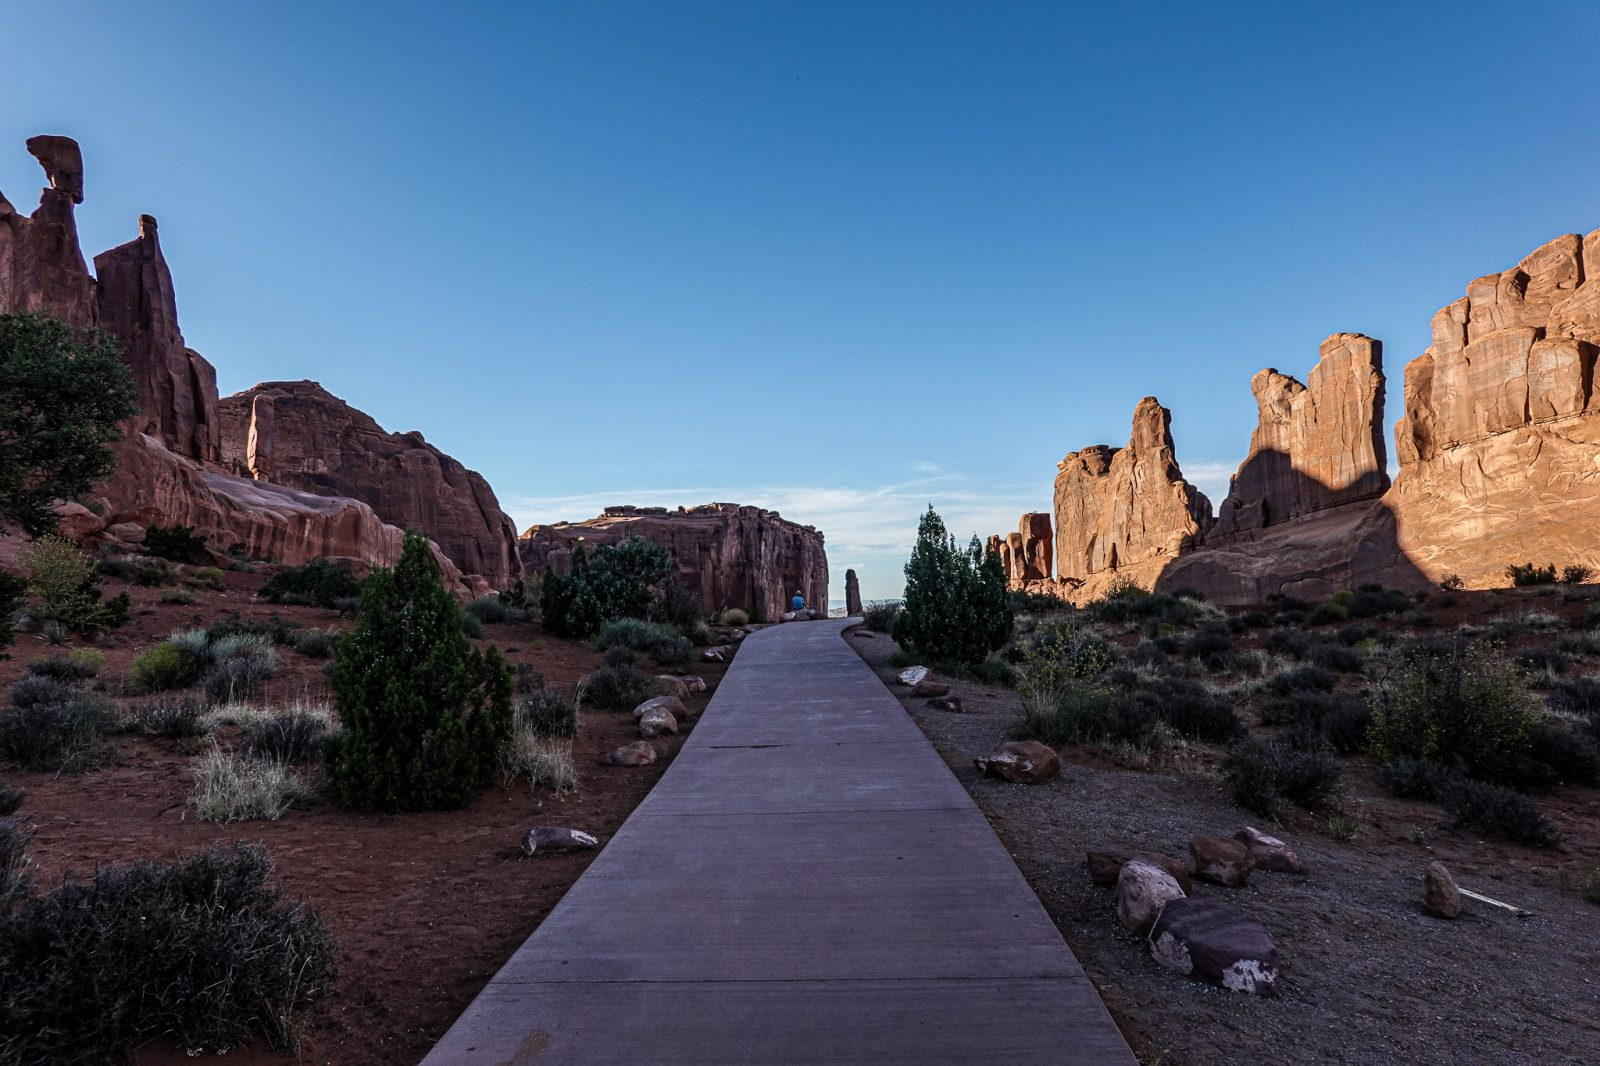 Solnedgang i Arches nationalpark